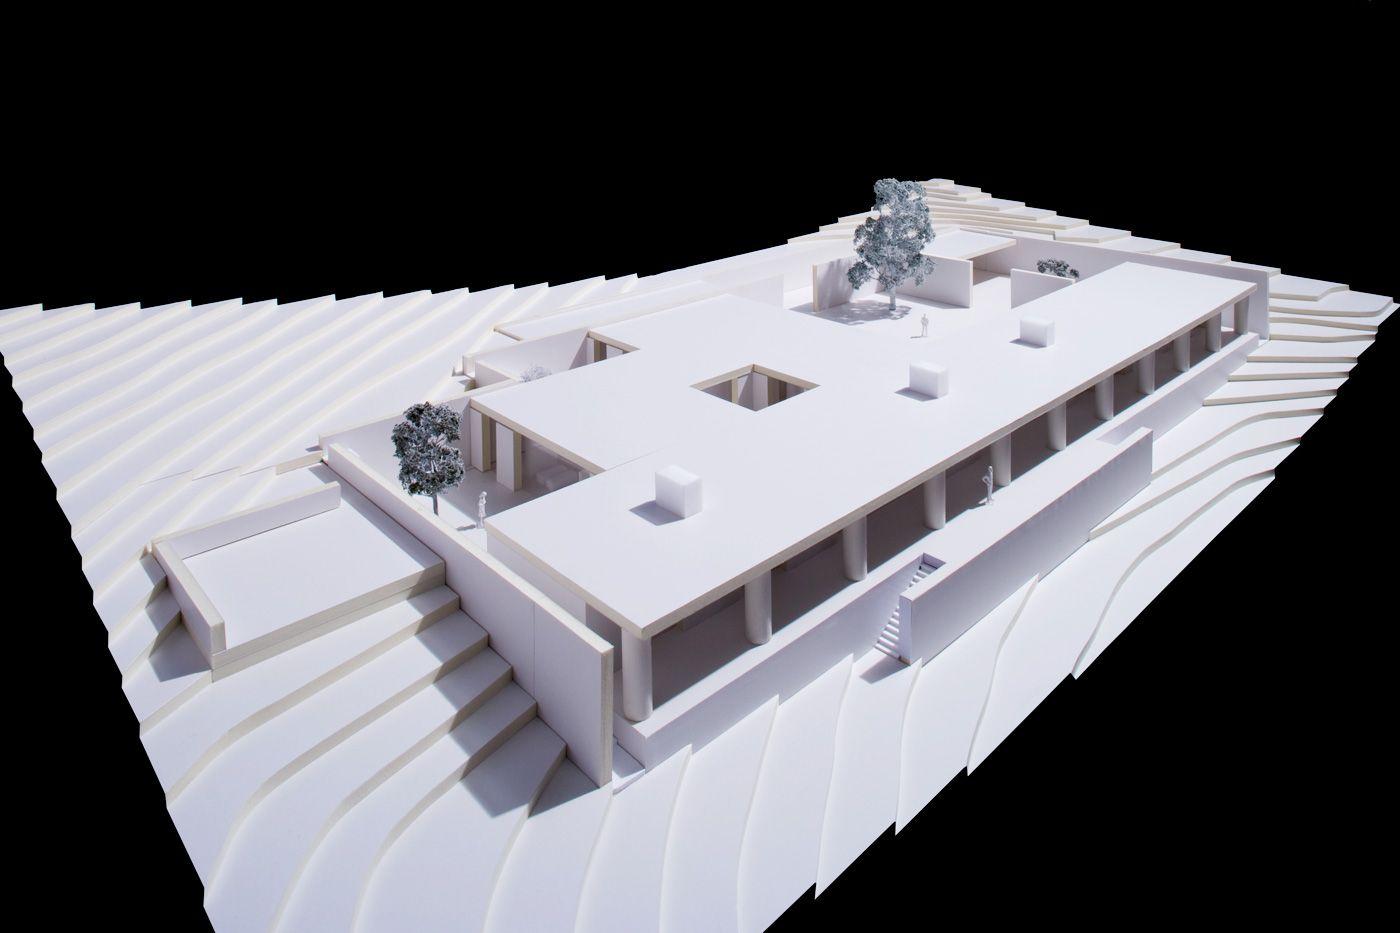 http://www.davidchipperfield.co.uk/project/fayland_house